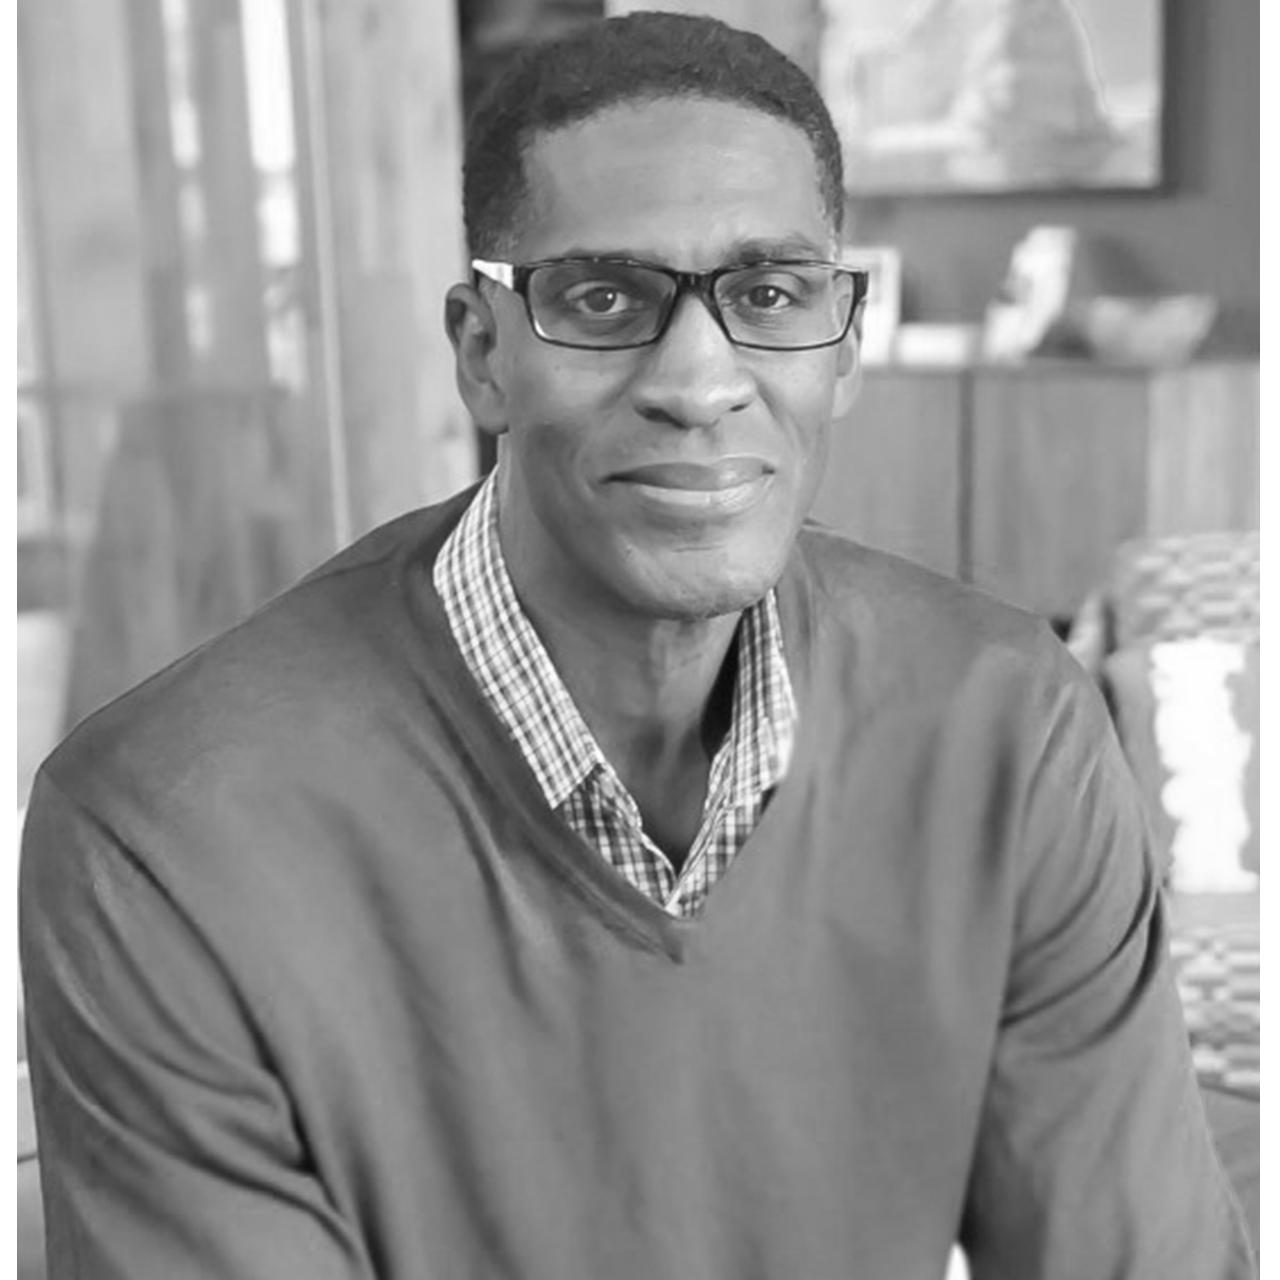 Charles D. Smith Fierce Facilitator